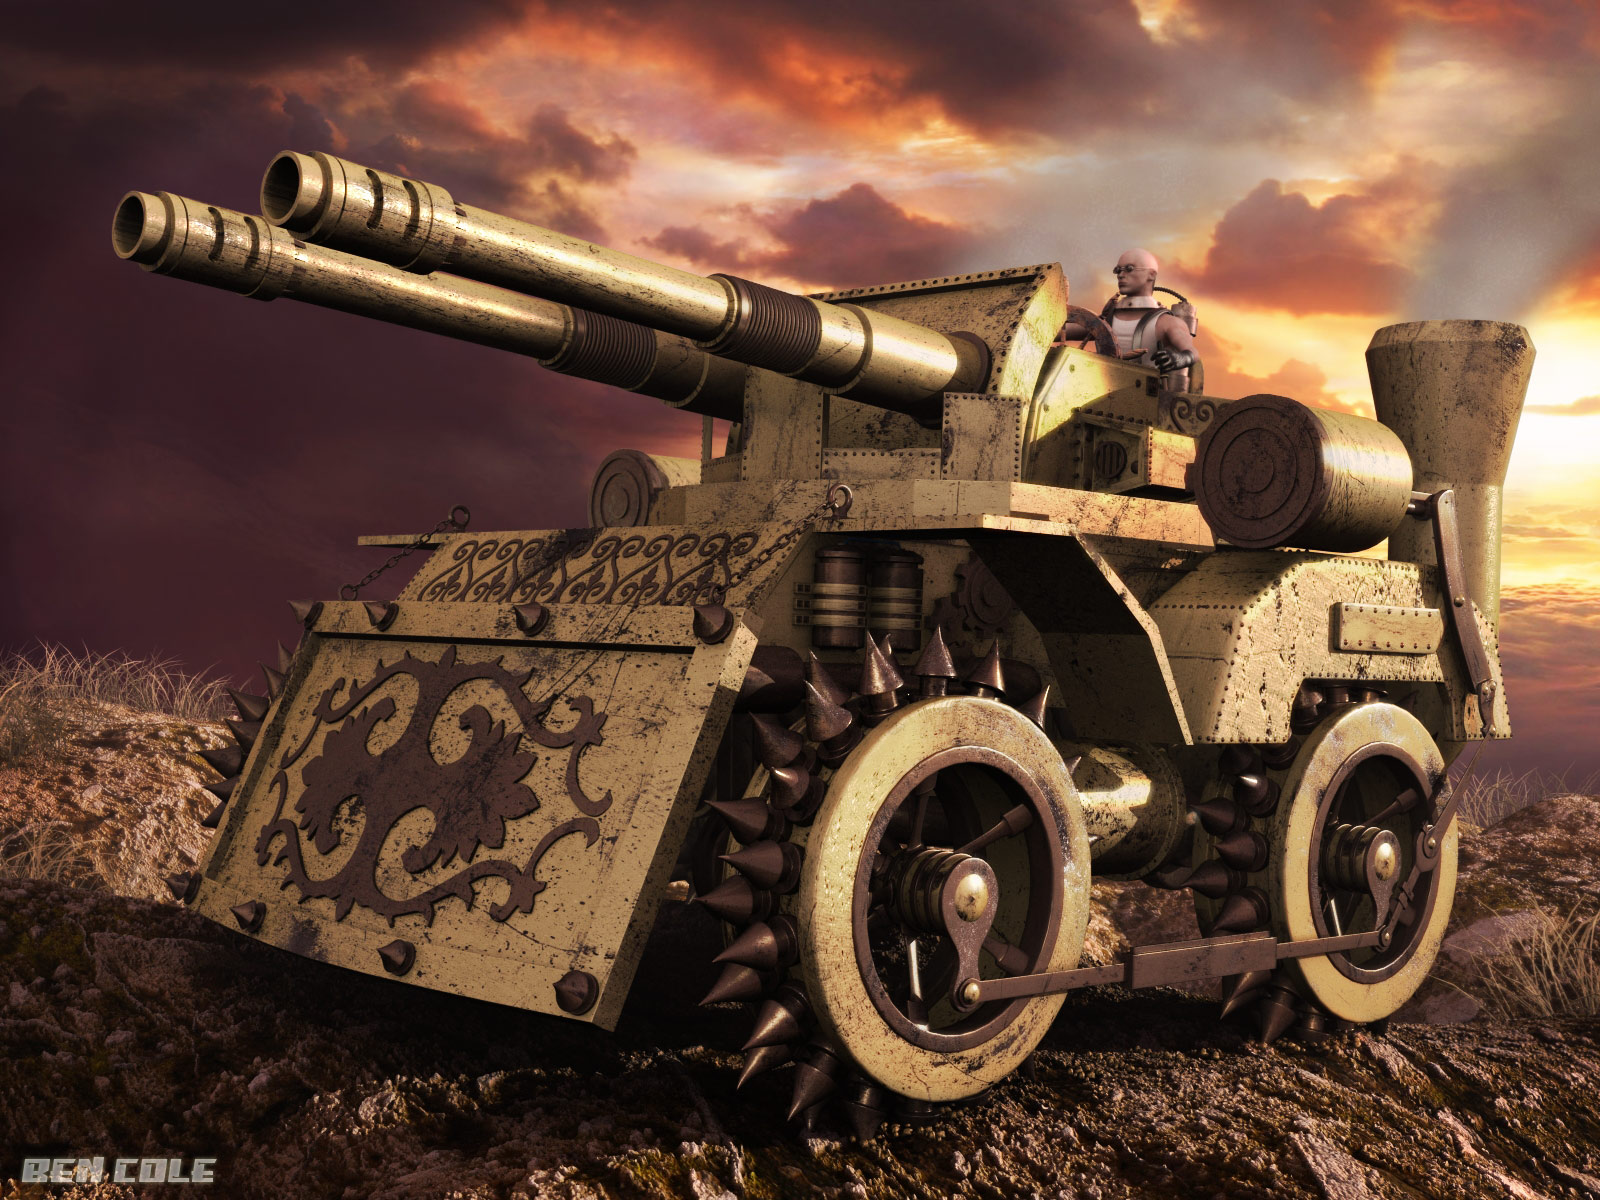 http://fc05.deviantart.com/fs40/f/2009/048/b/7/Steampunk_Tank_Final1_by_BenCole.jpg